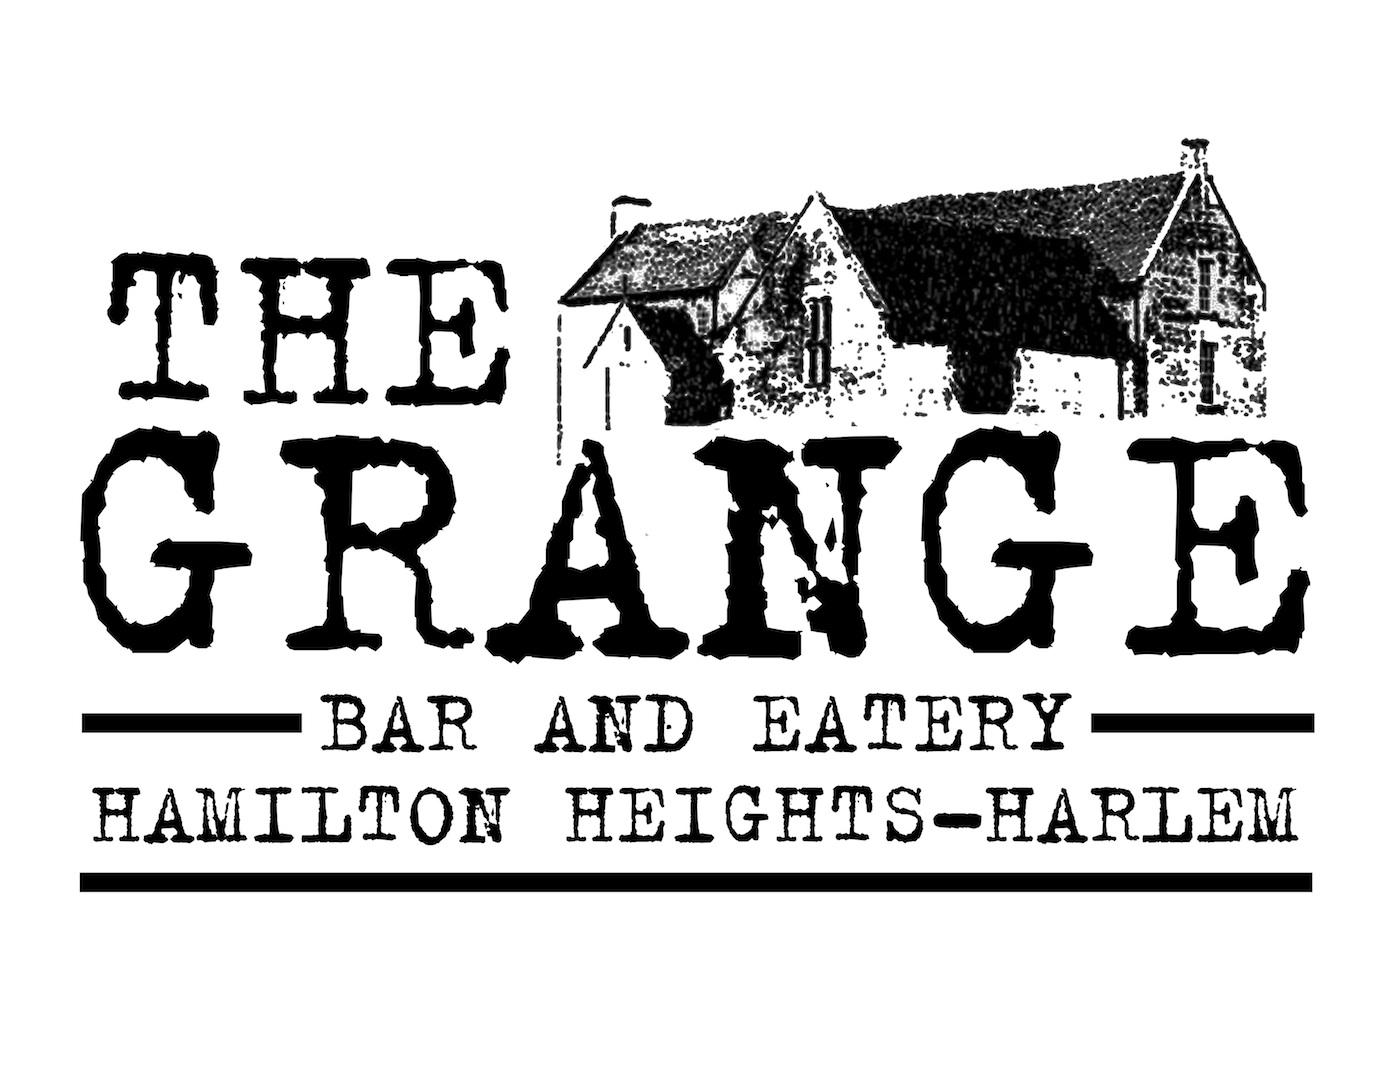 http://2.bp.blogspot.com/-v52JdVBfh-U/UTaZUL4G6zI/AAAAAAAAelY/kO6hfGBasQM/s1600/the+grange+small+logo.jpg